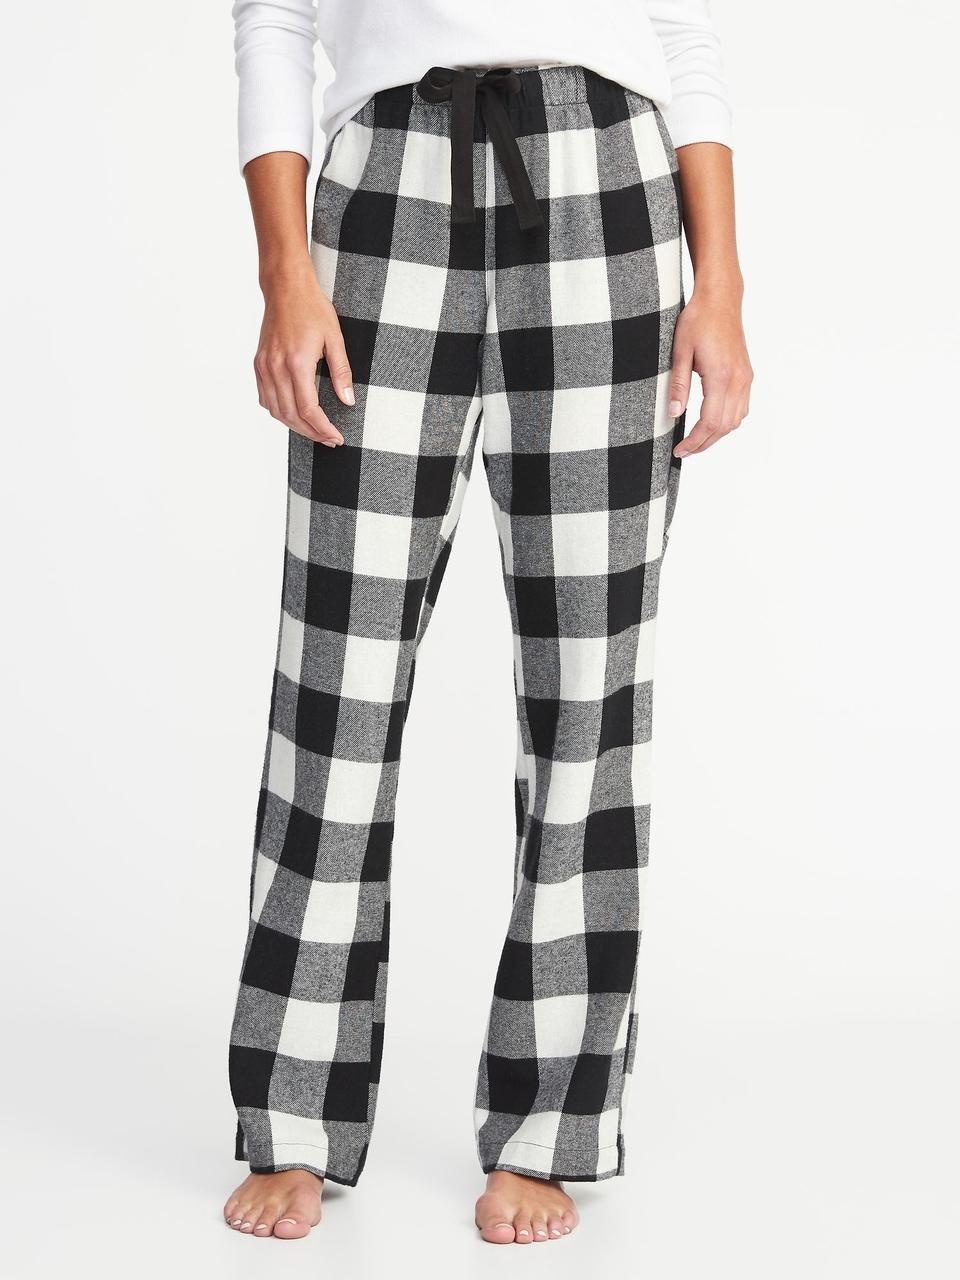 Женские штаны фланелевые XS M пижама домашние Old Navy США XS